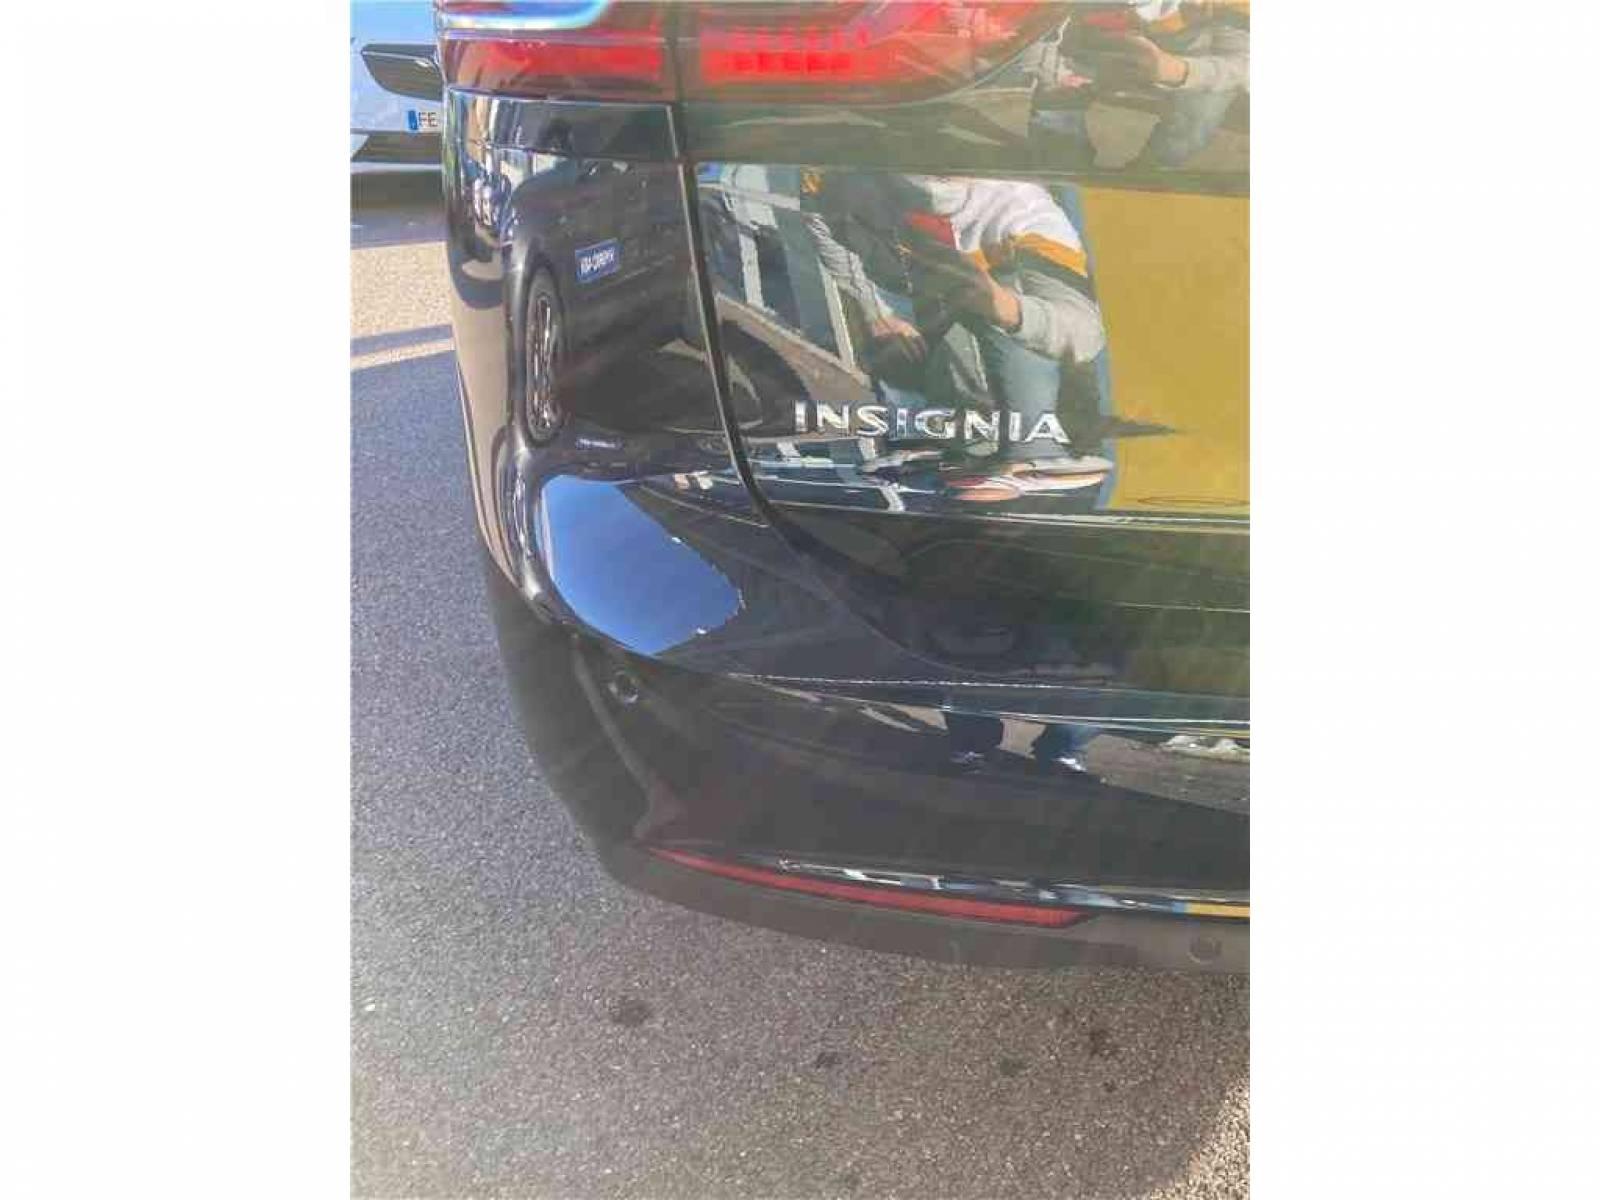 OPEL Insignia Sports Tourer 1.5 Turbo 165 ch BVA6 - véhicule d'occasion - Groupe Guillet - Opel Magicauto - Chalon-sur-Saône - 71380 - Saint-Marcel - 17